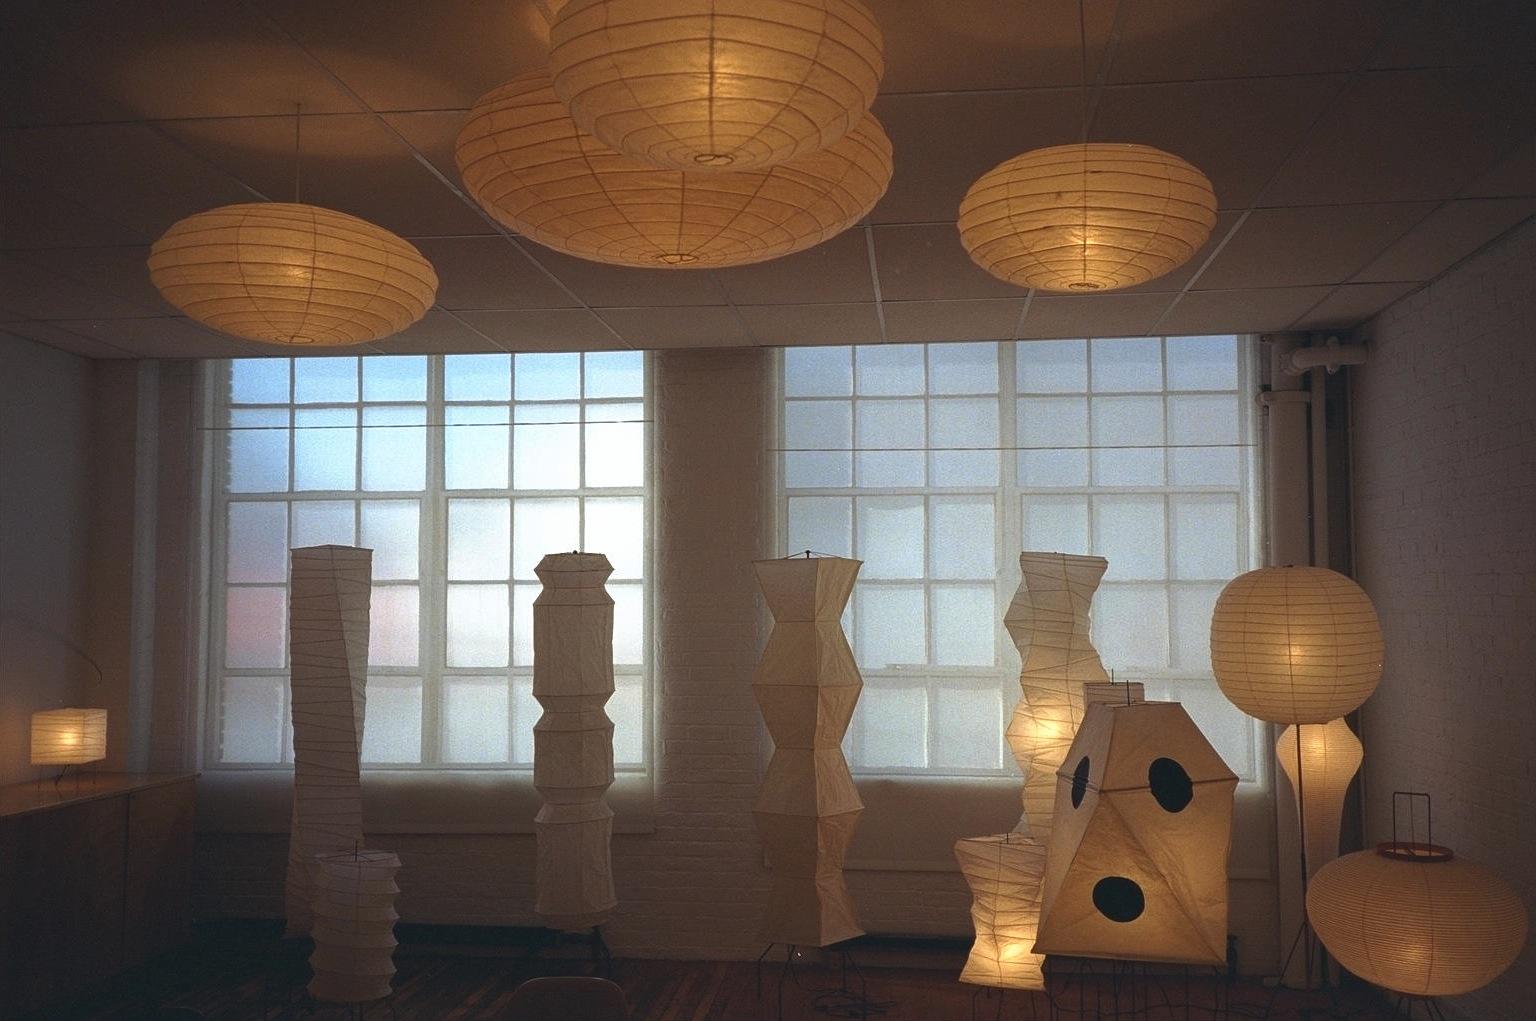 Noguchi's Akari Light Sculptures in the upper level of the Noguchi Museum